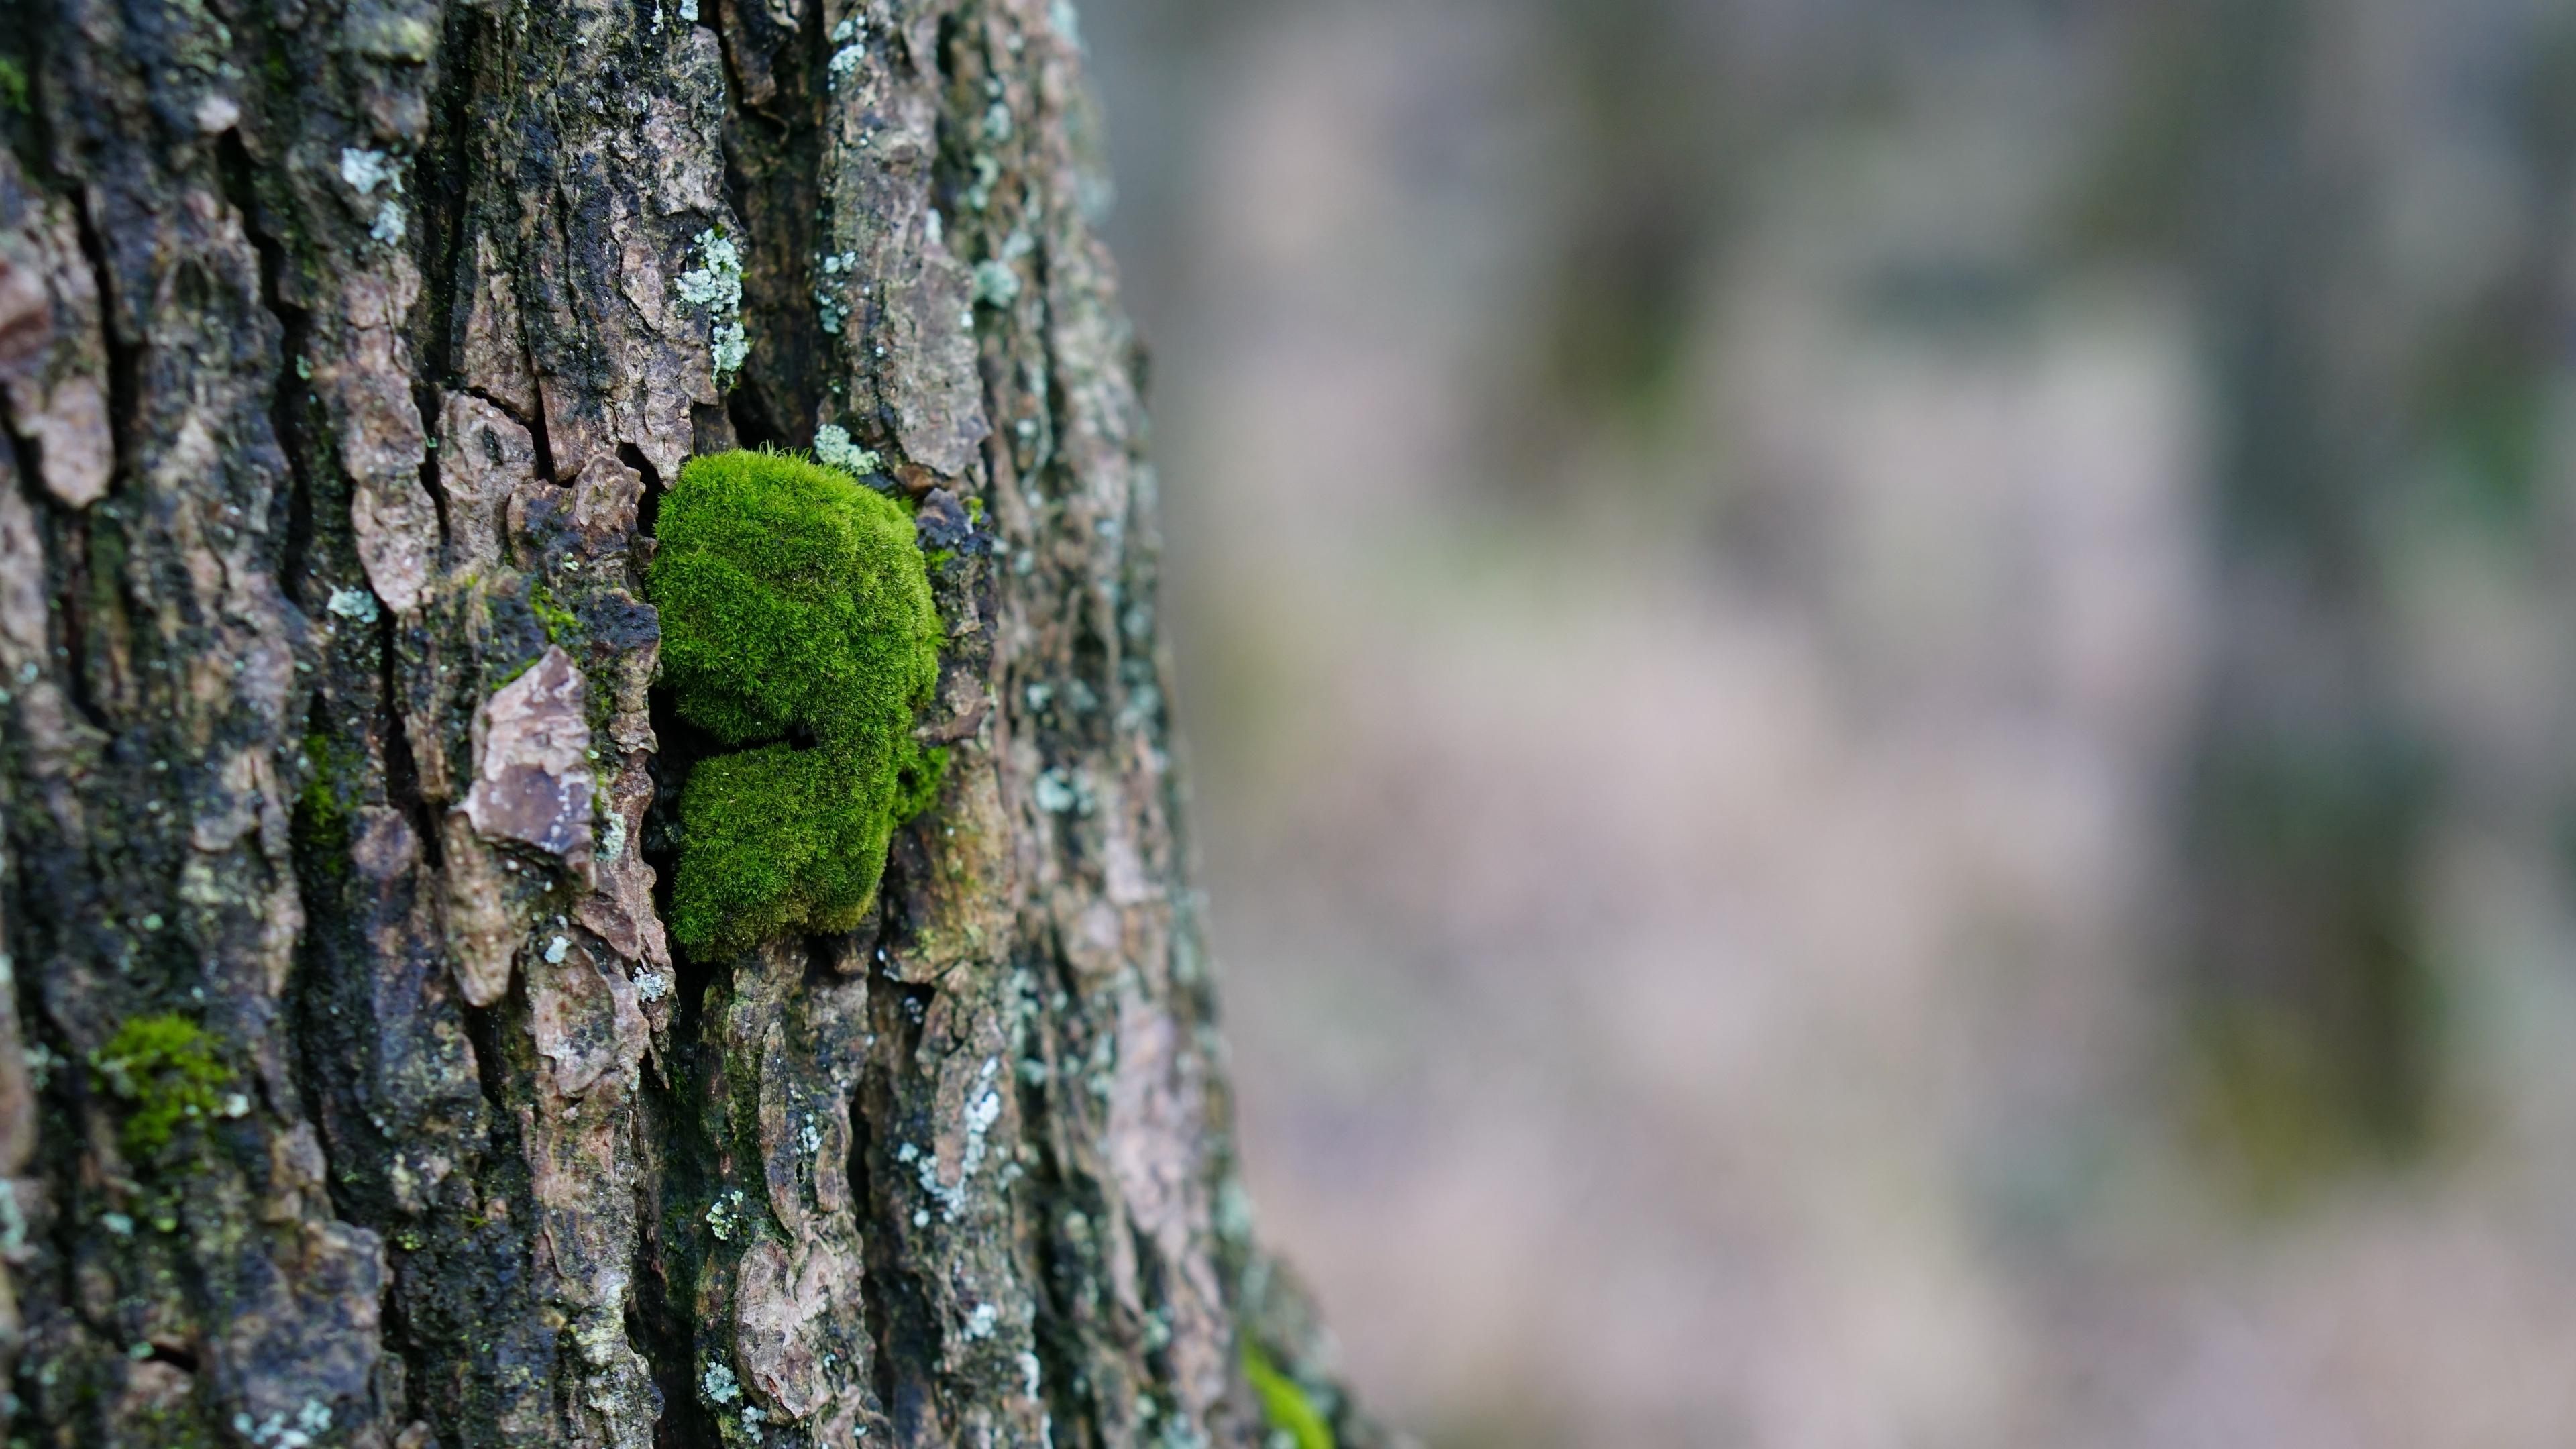 tree bark wood moss 4k 1541117893 - tree bark, wood, moss 4k - wood, tree bark, moss